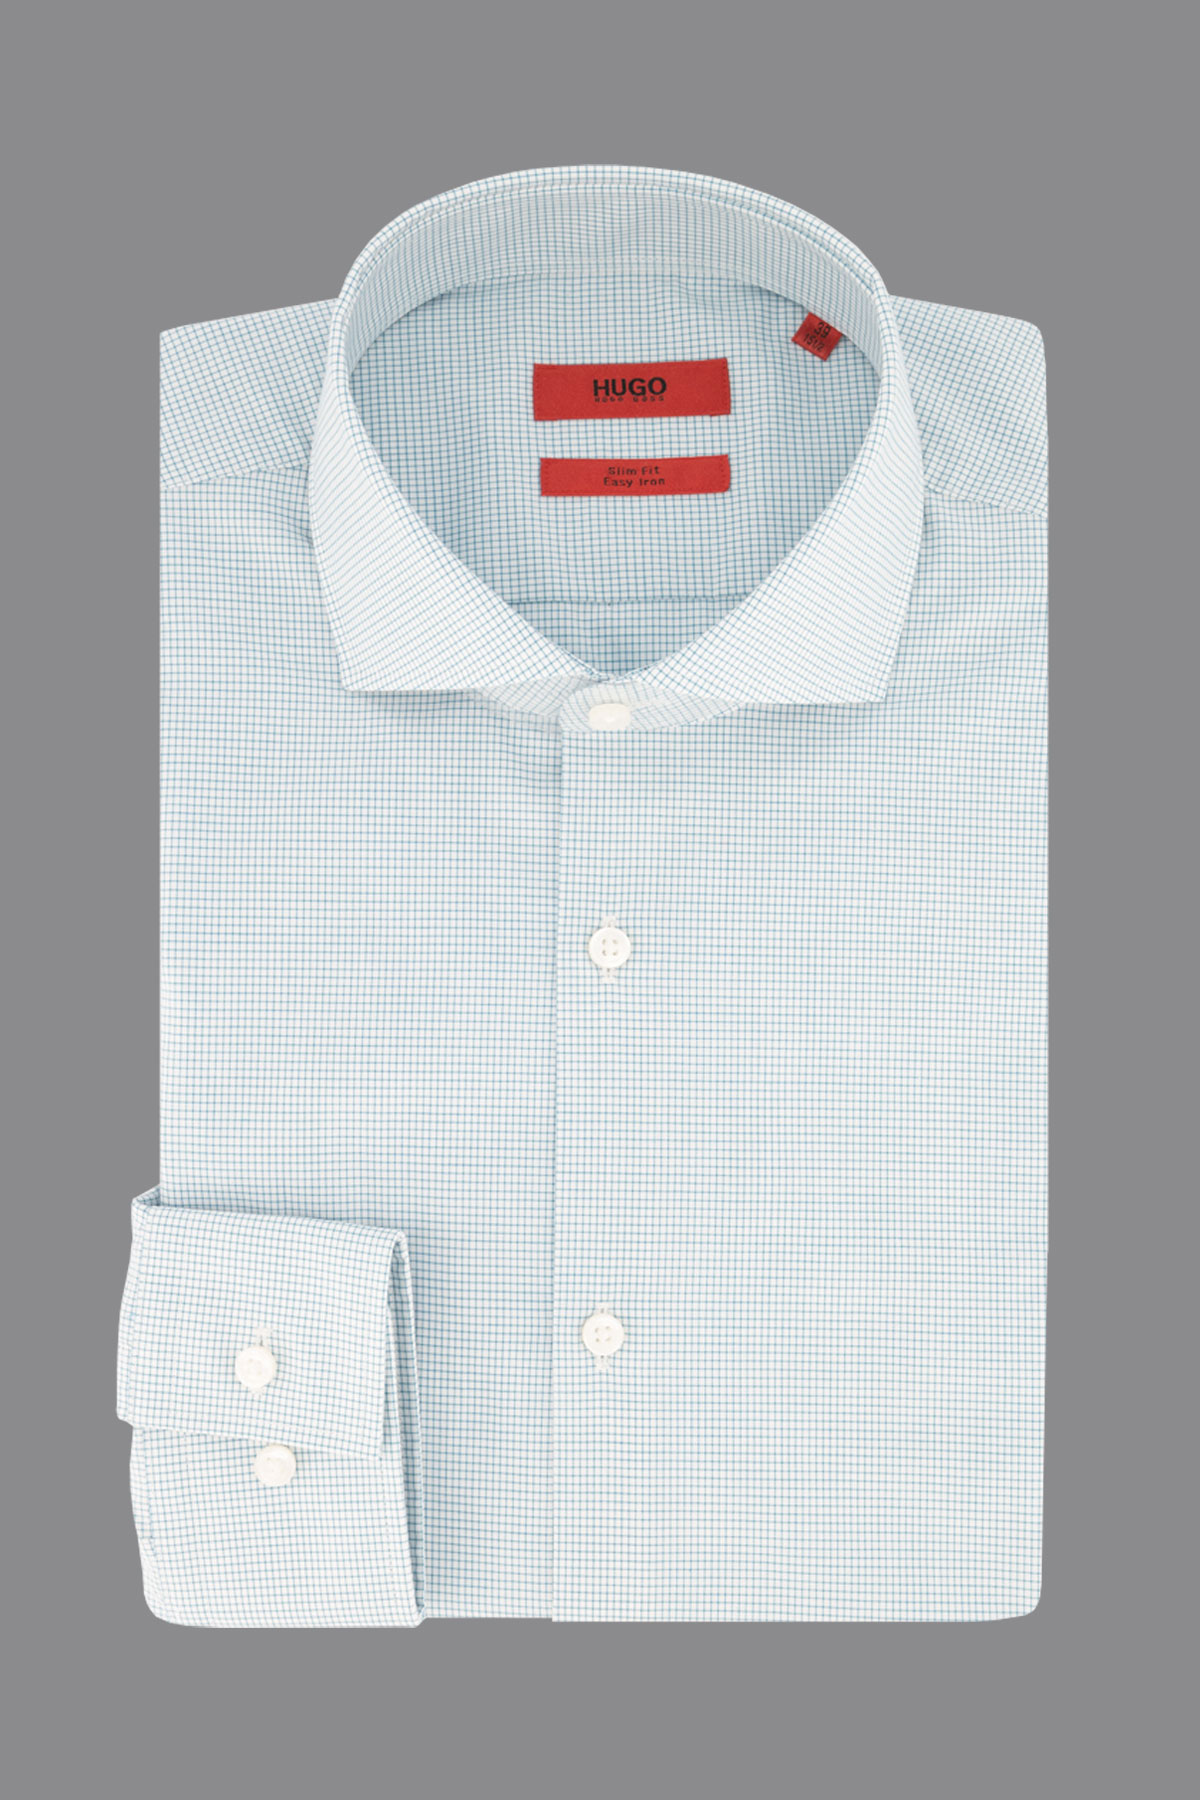 Camisa de vestir Hugo Boss, slim fit, Esay Iron, cuadrille celeste.